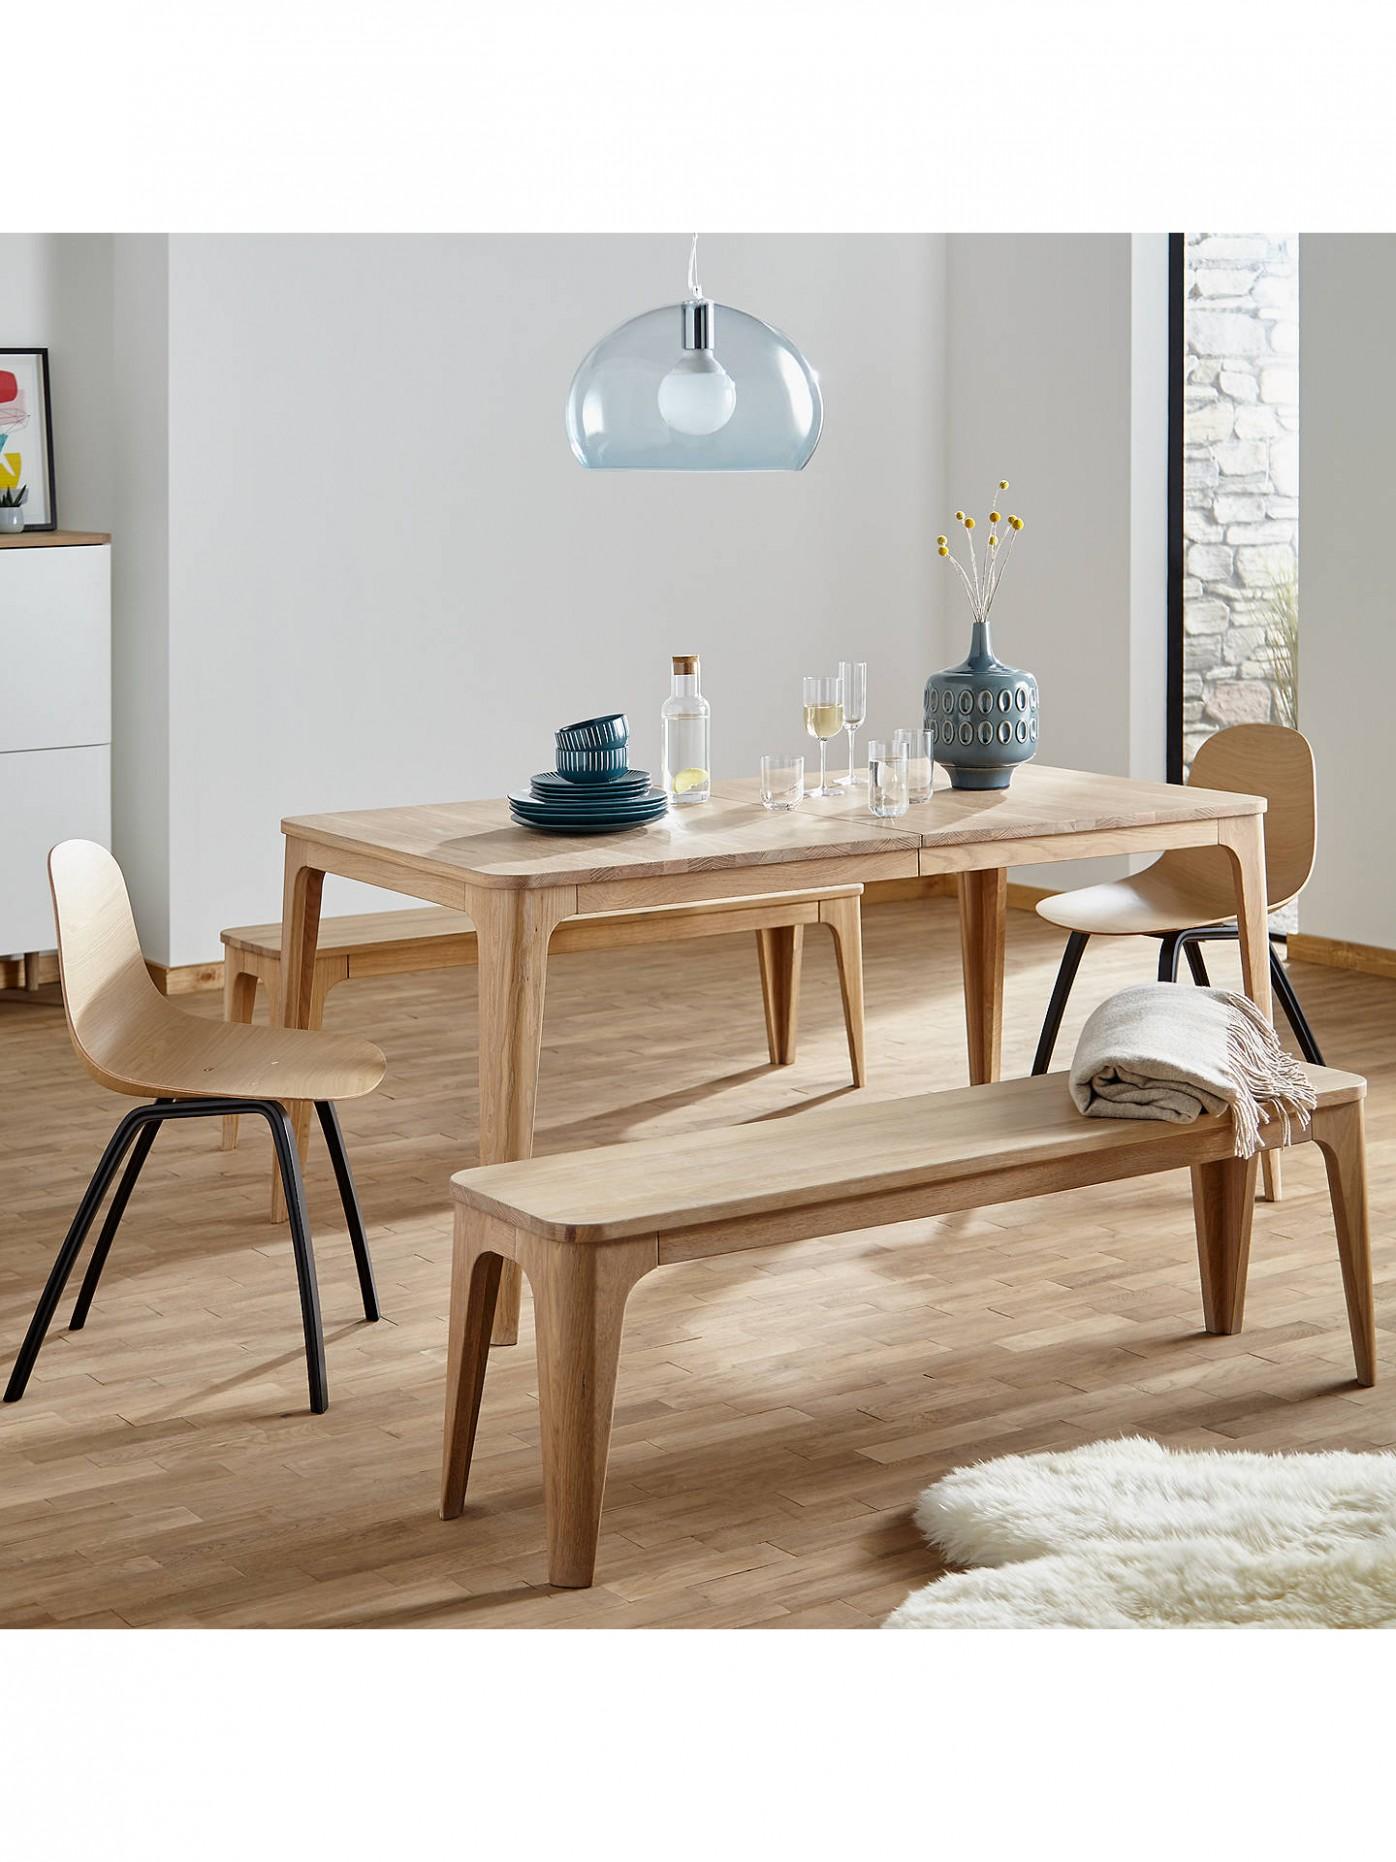 Ebbe Gehl for John Lewis Mira 9-9 Seater Extending Dining Table, Oak - John Lewis Dining Room Ideas